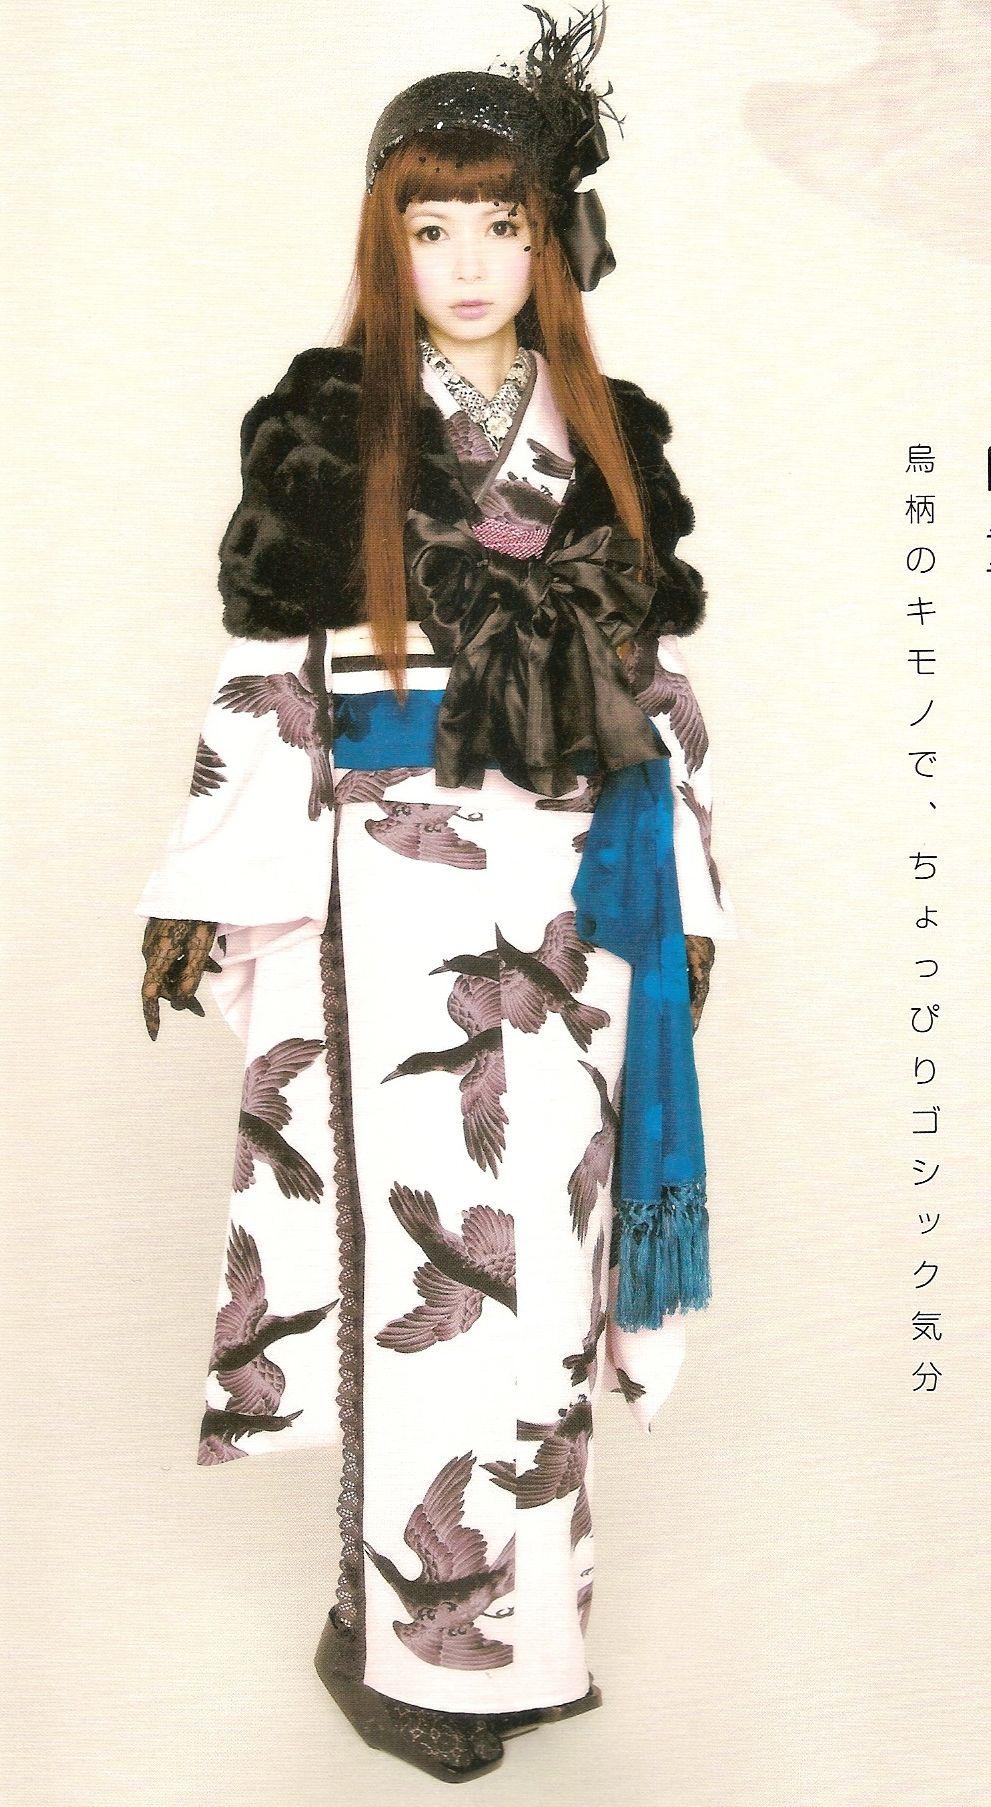 kimono hime issue 10 fashion shoot page 48 via satomi. Black Bedroom Furniture Sets. Home Design Ideas